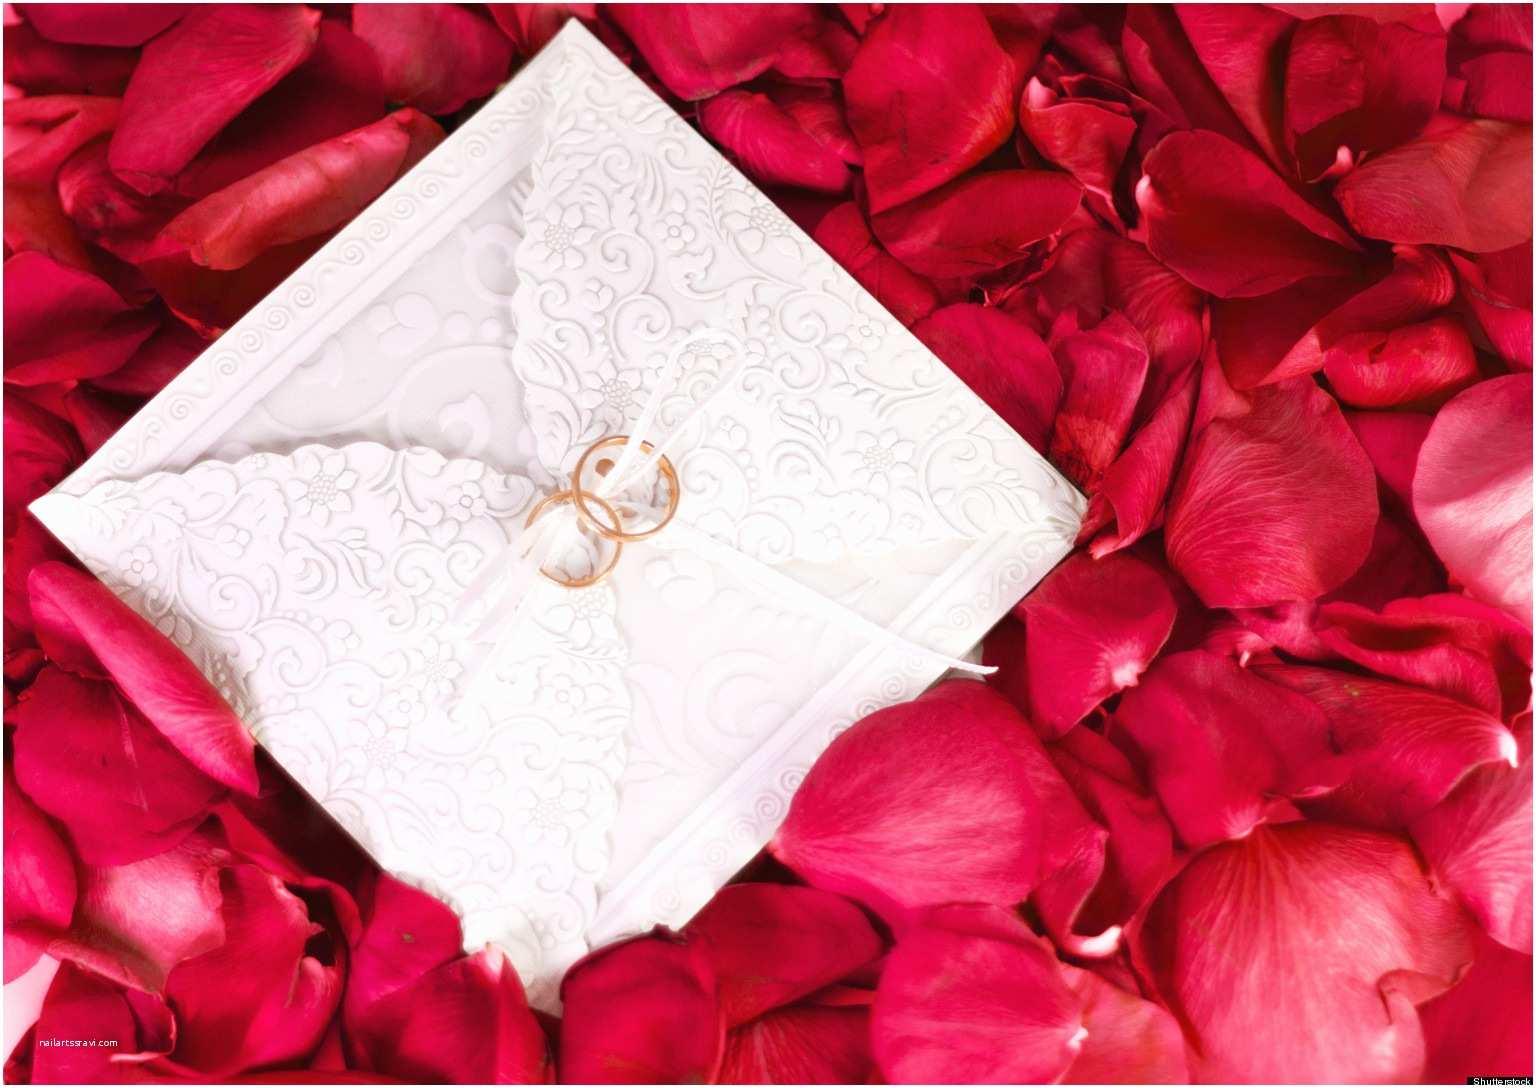 Facebook Wedding Invitation the Best and Worst Movie themed Wedding Invites